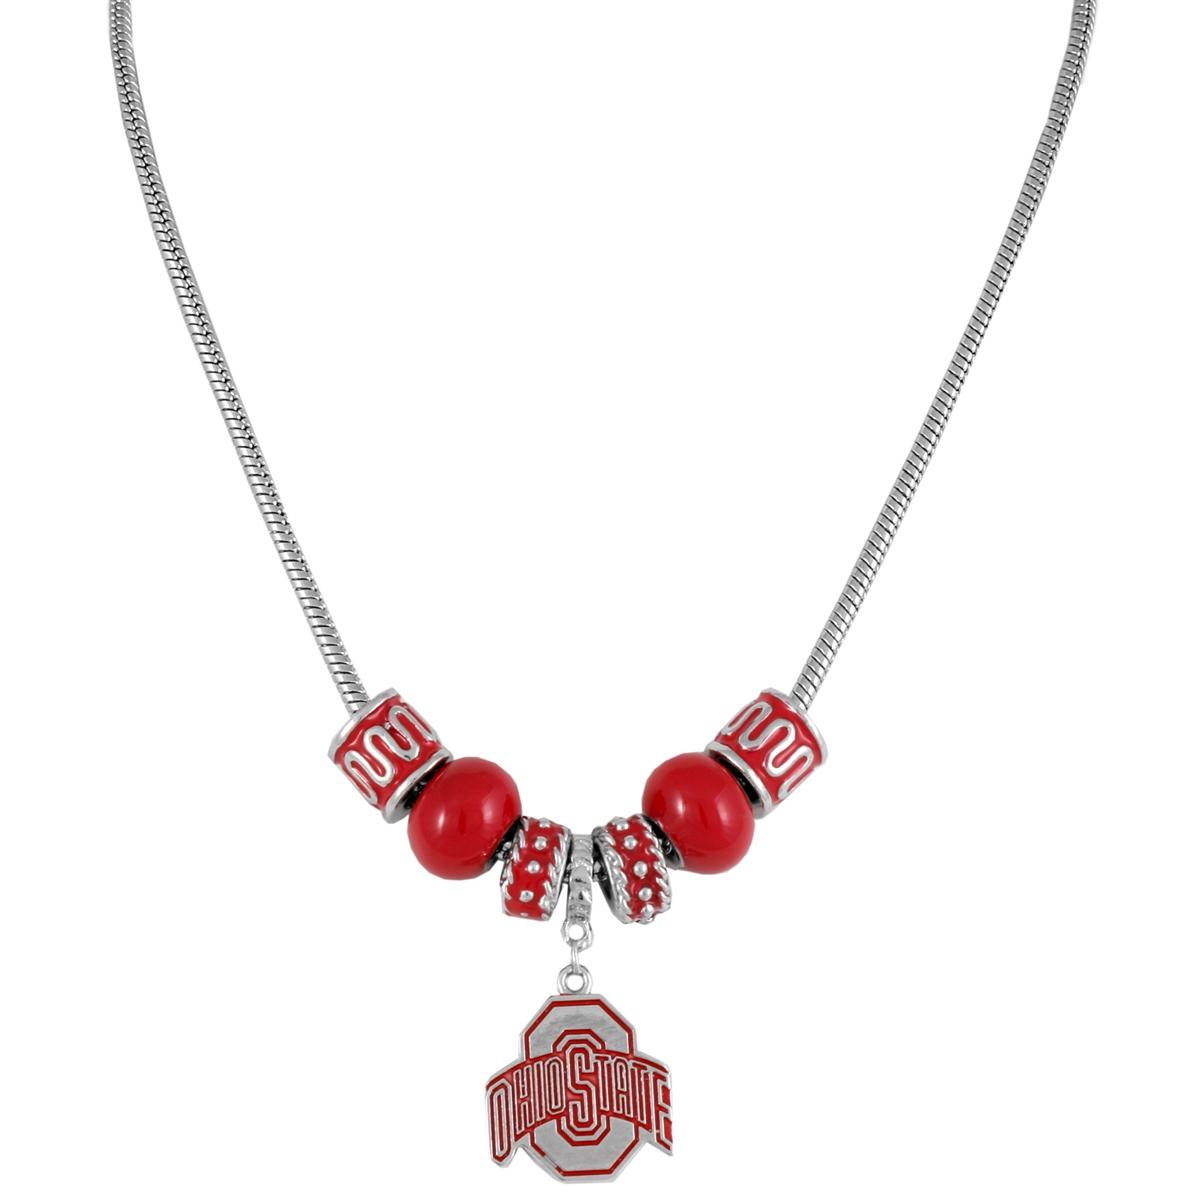 Charm necklace ohio state university buckeyes collegiate necklace charm necklace ohio state buckeyes aloadofball Image collections